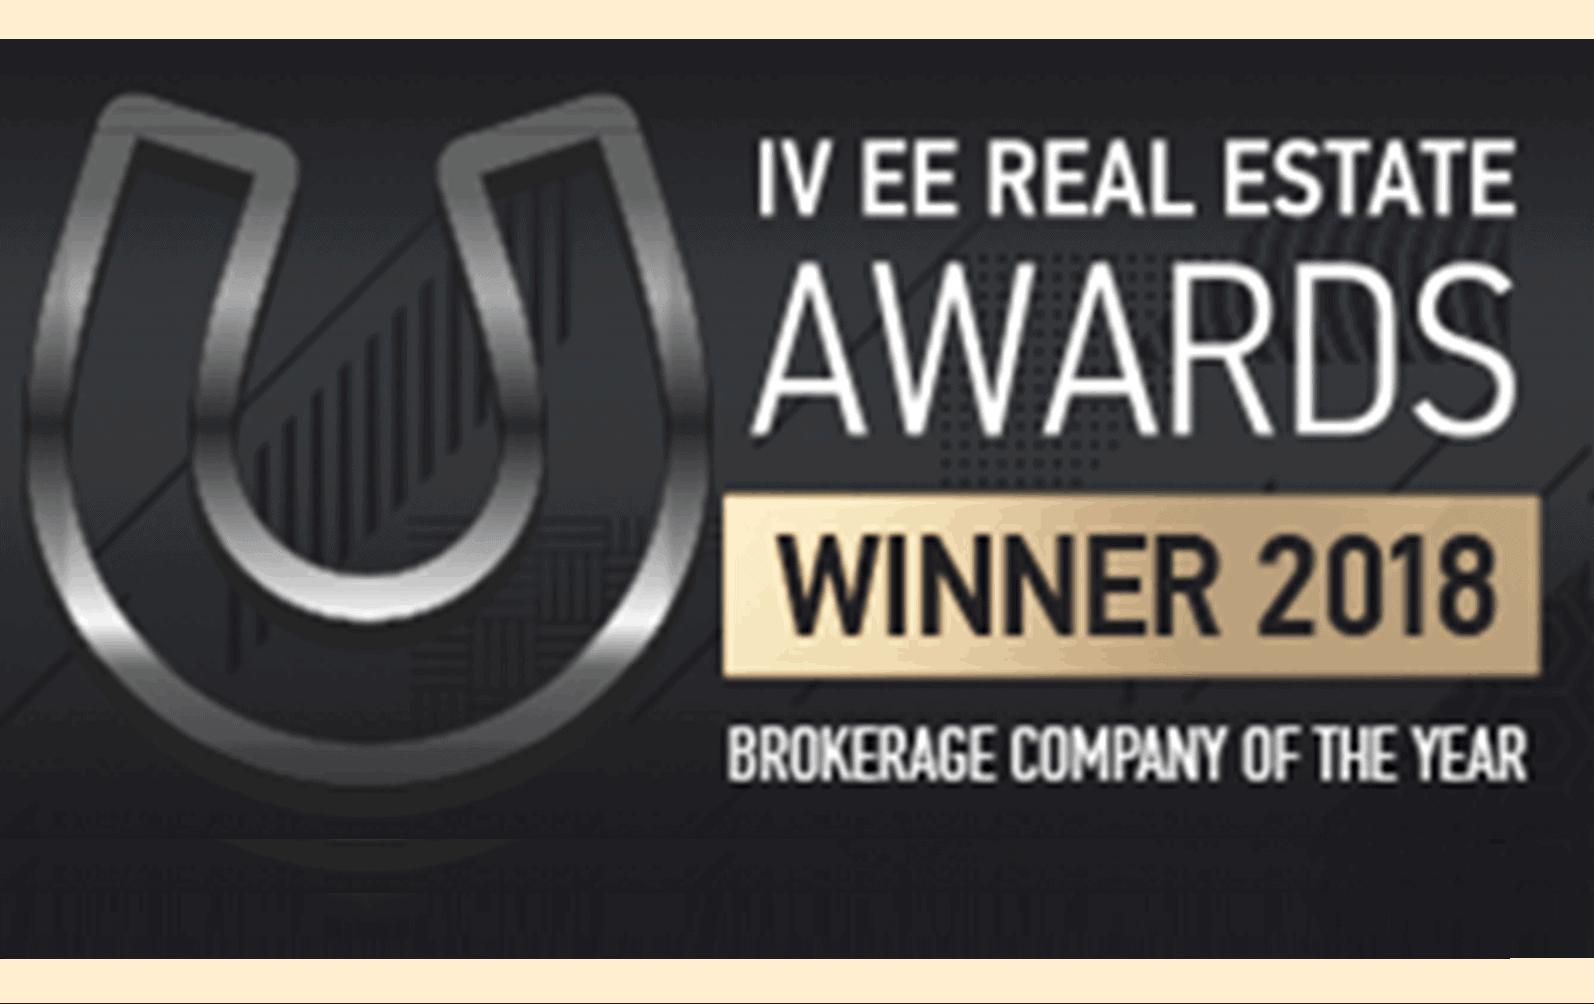 IV Eastern Europe Real Estate Awards 2018